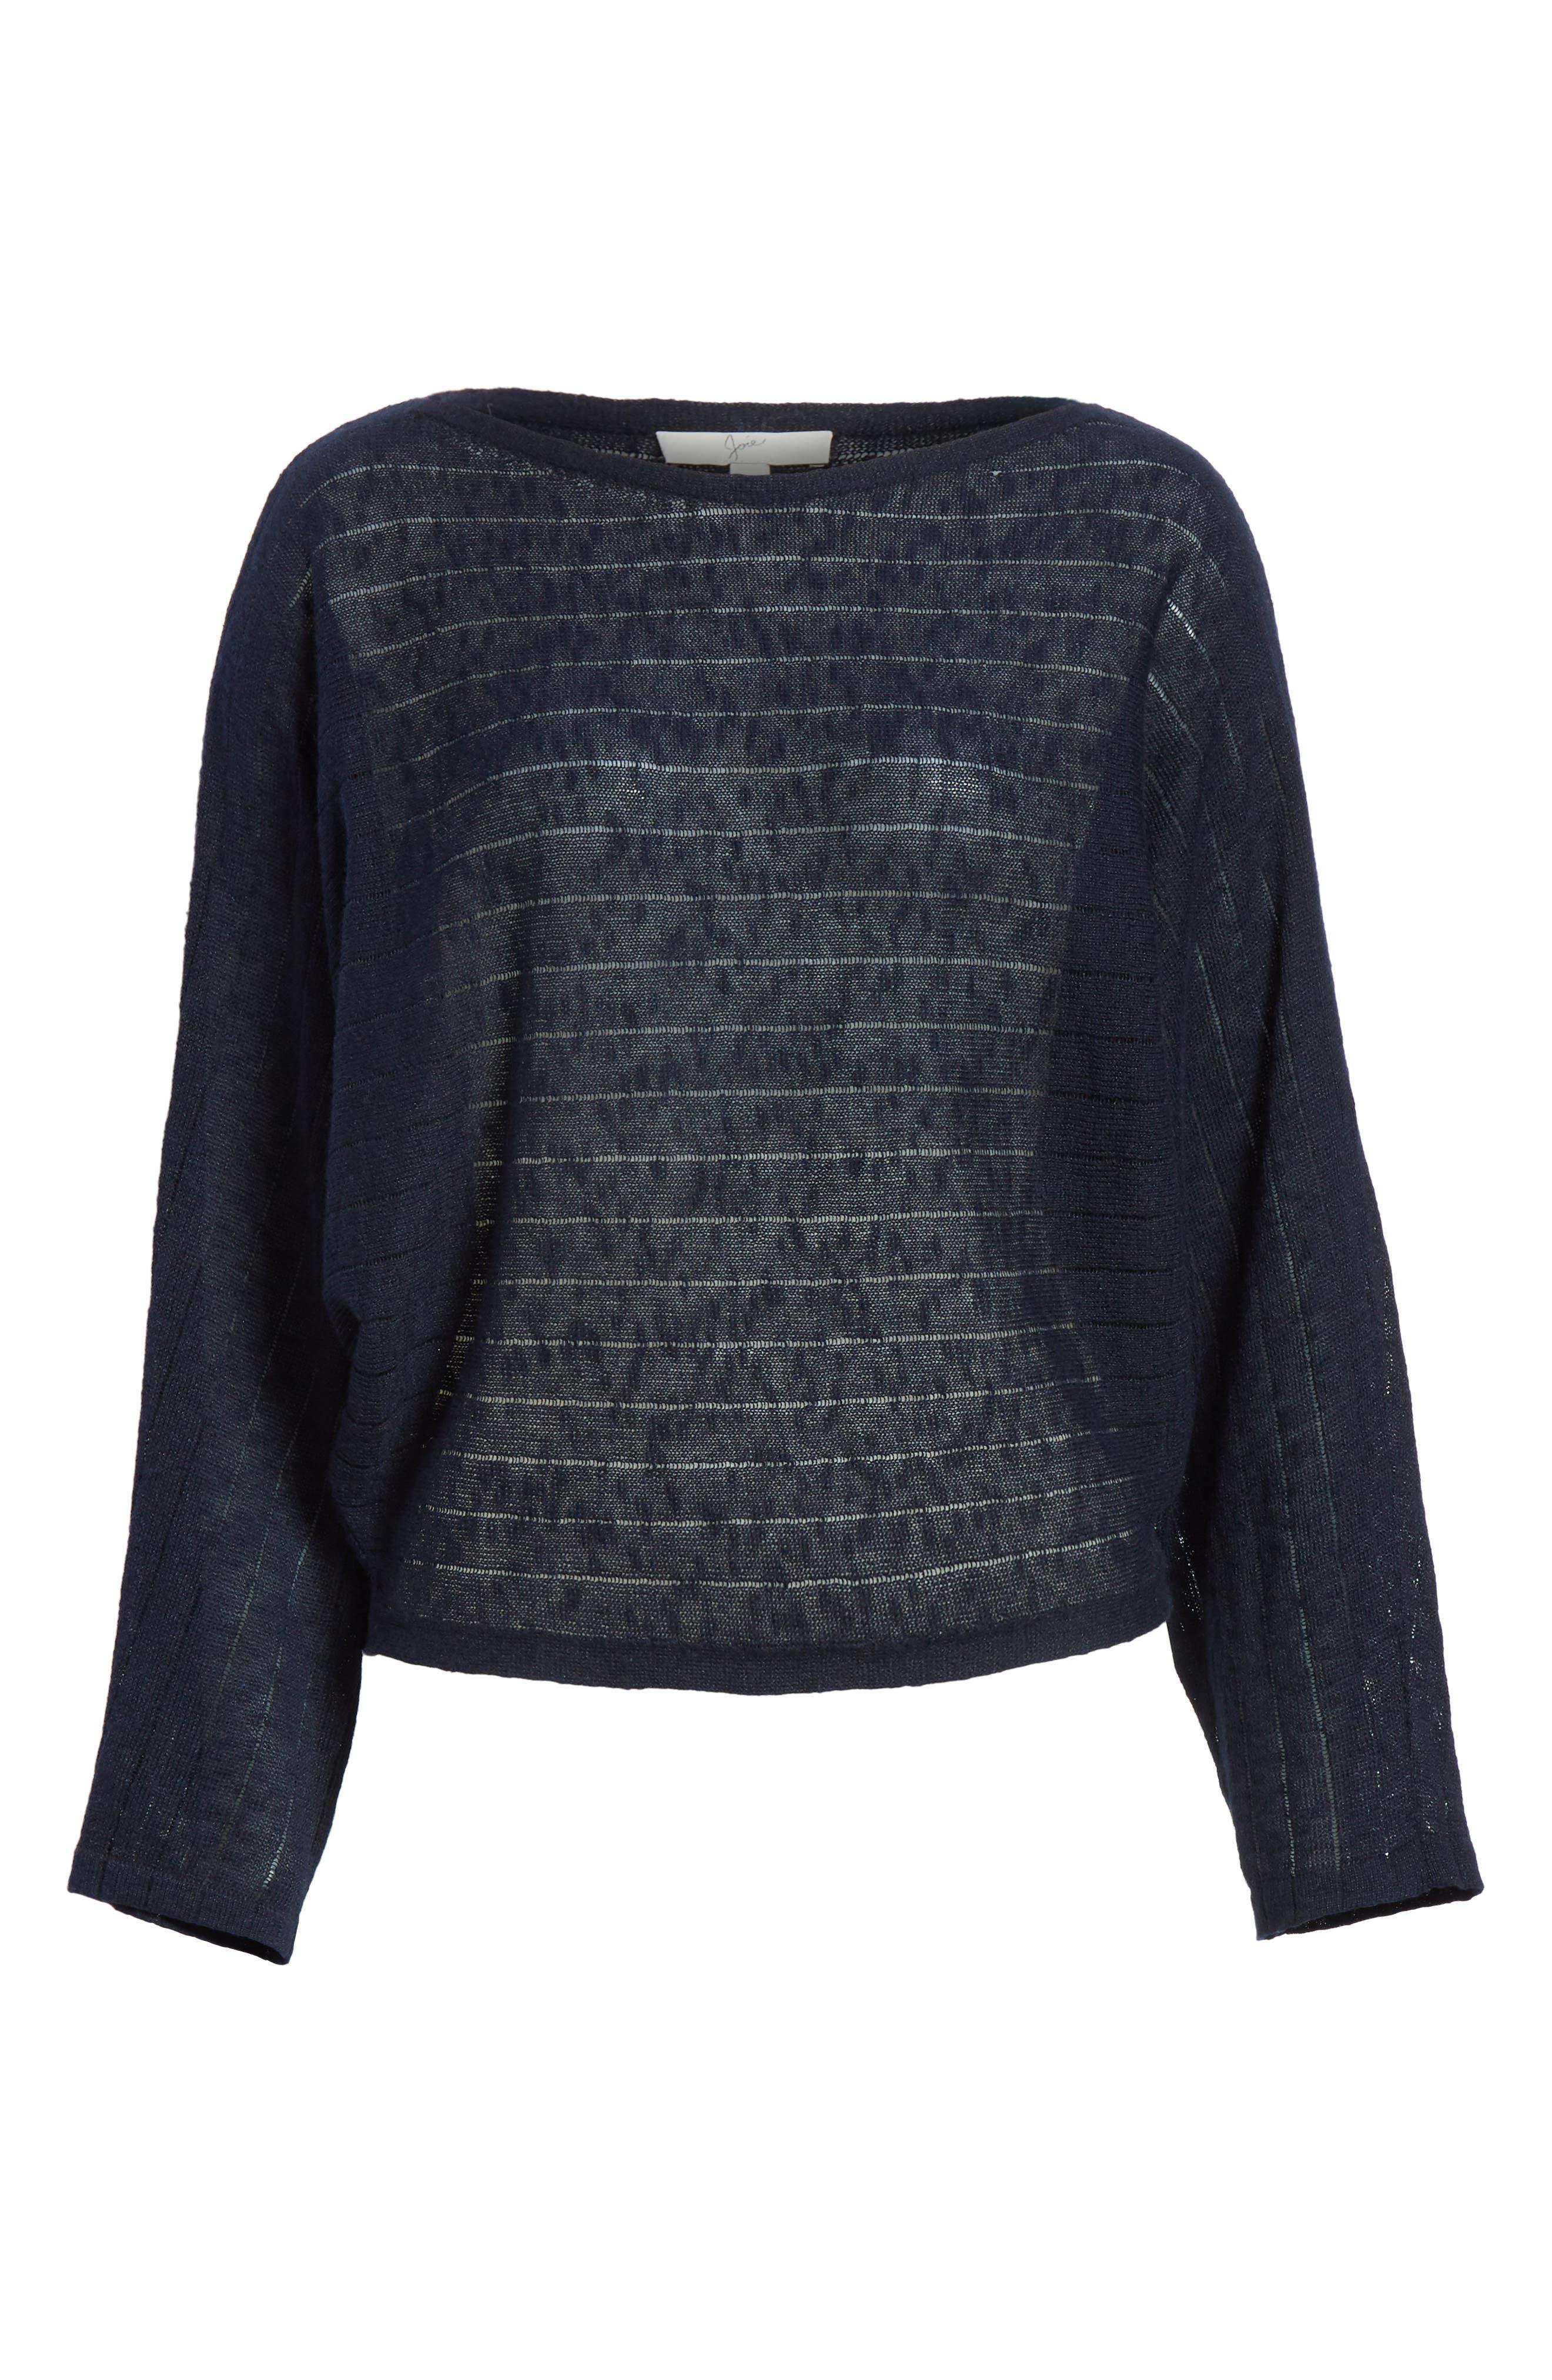 Ramie Cotton Sweater,                             Alternate thumbnail 6, color,                             306